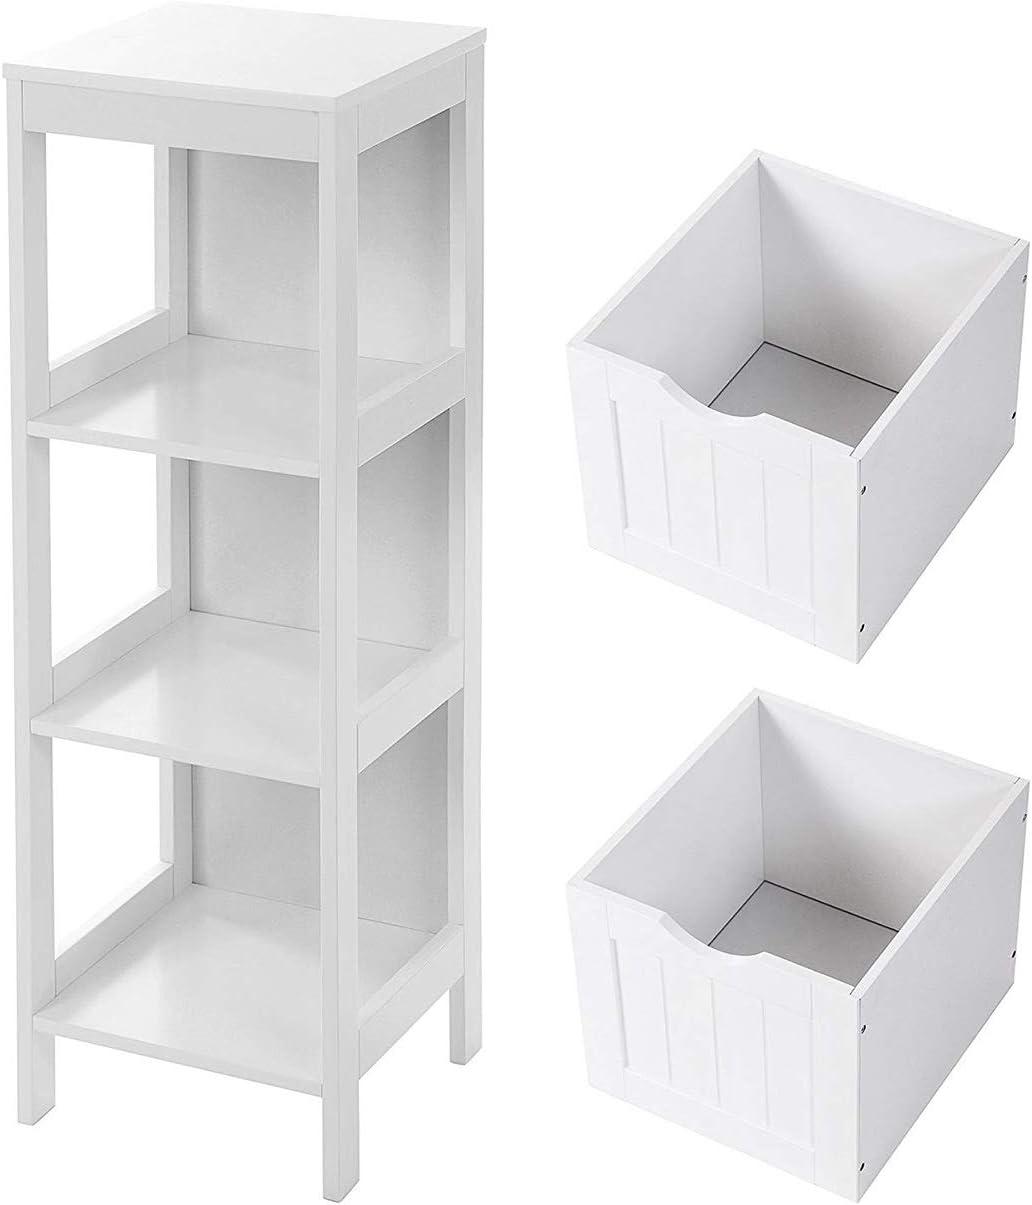 Brown UBBC42BR VASAGLE Floor Cabinet Multifunctional Corner Unit 2 Drawers Bathroom Storage Organizer Rack Stand